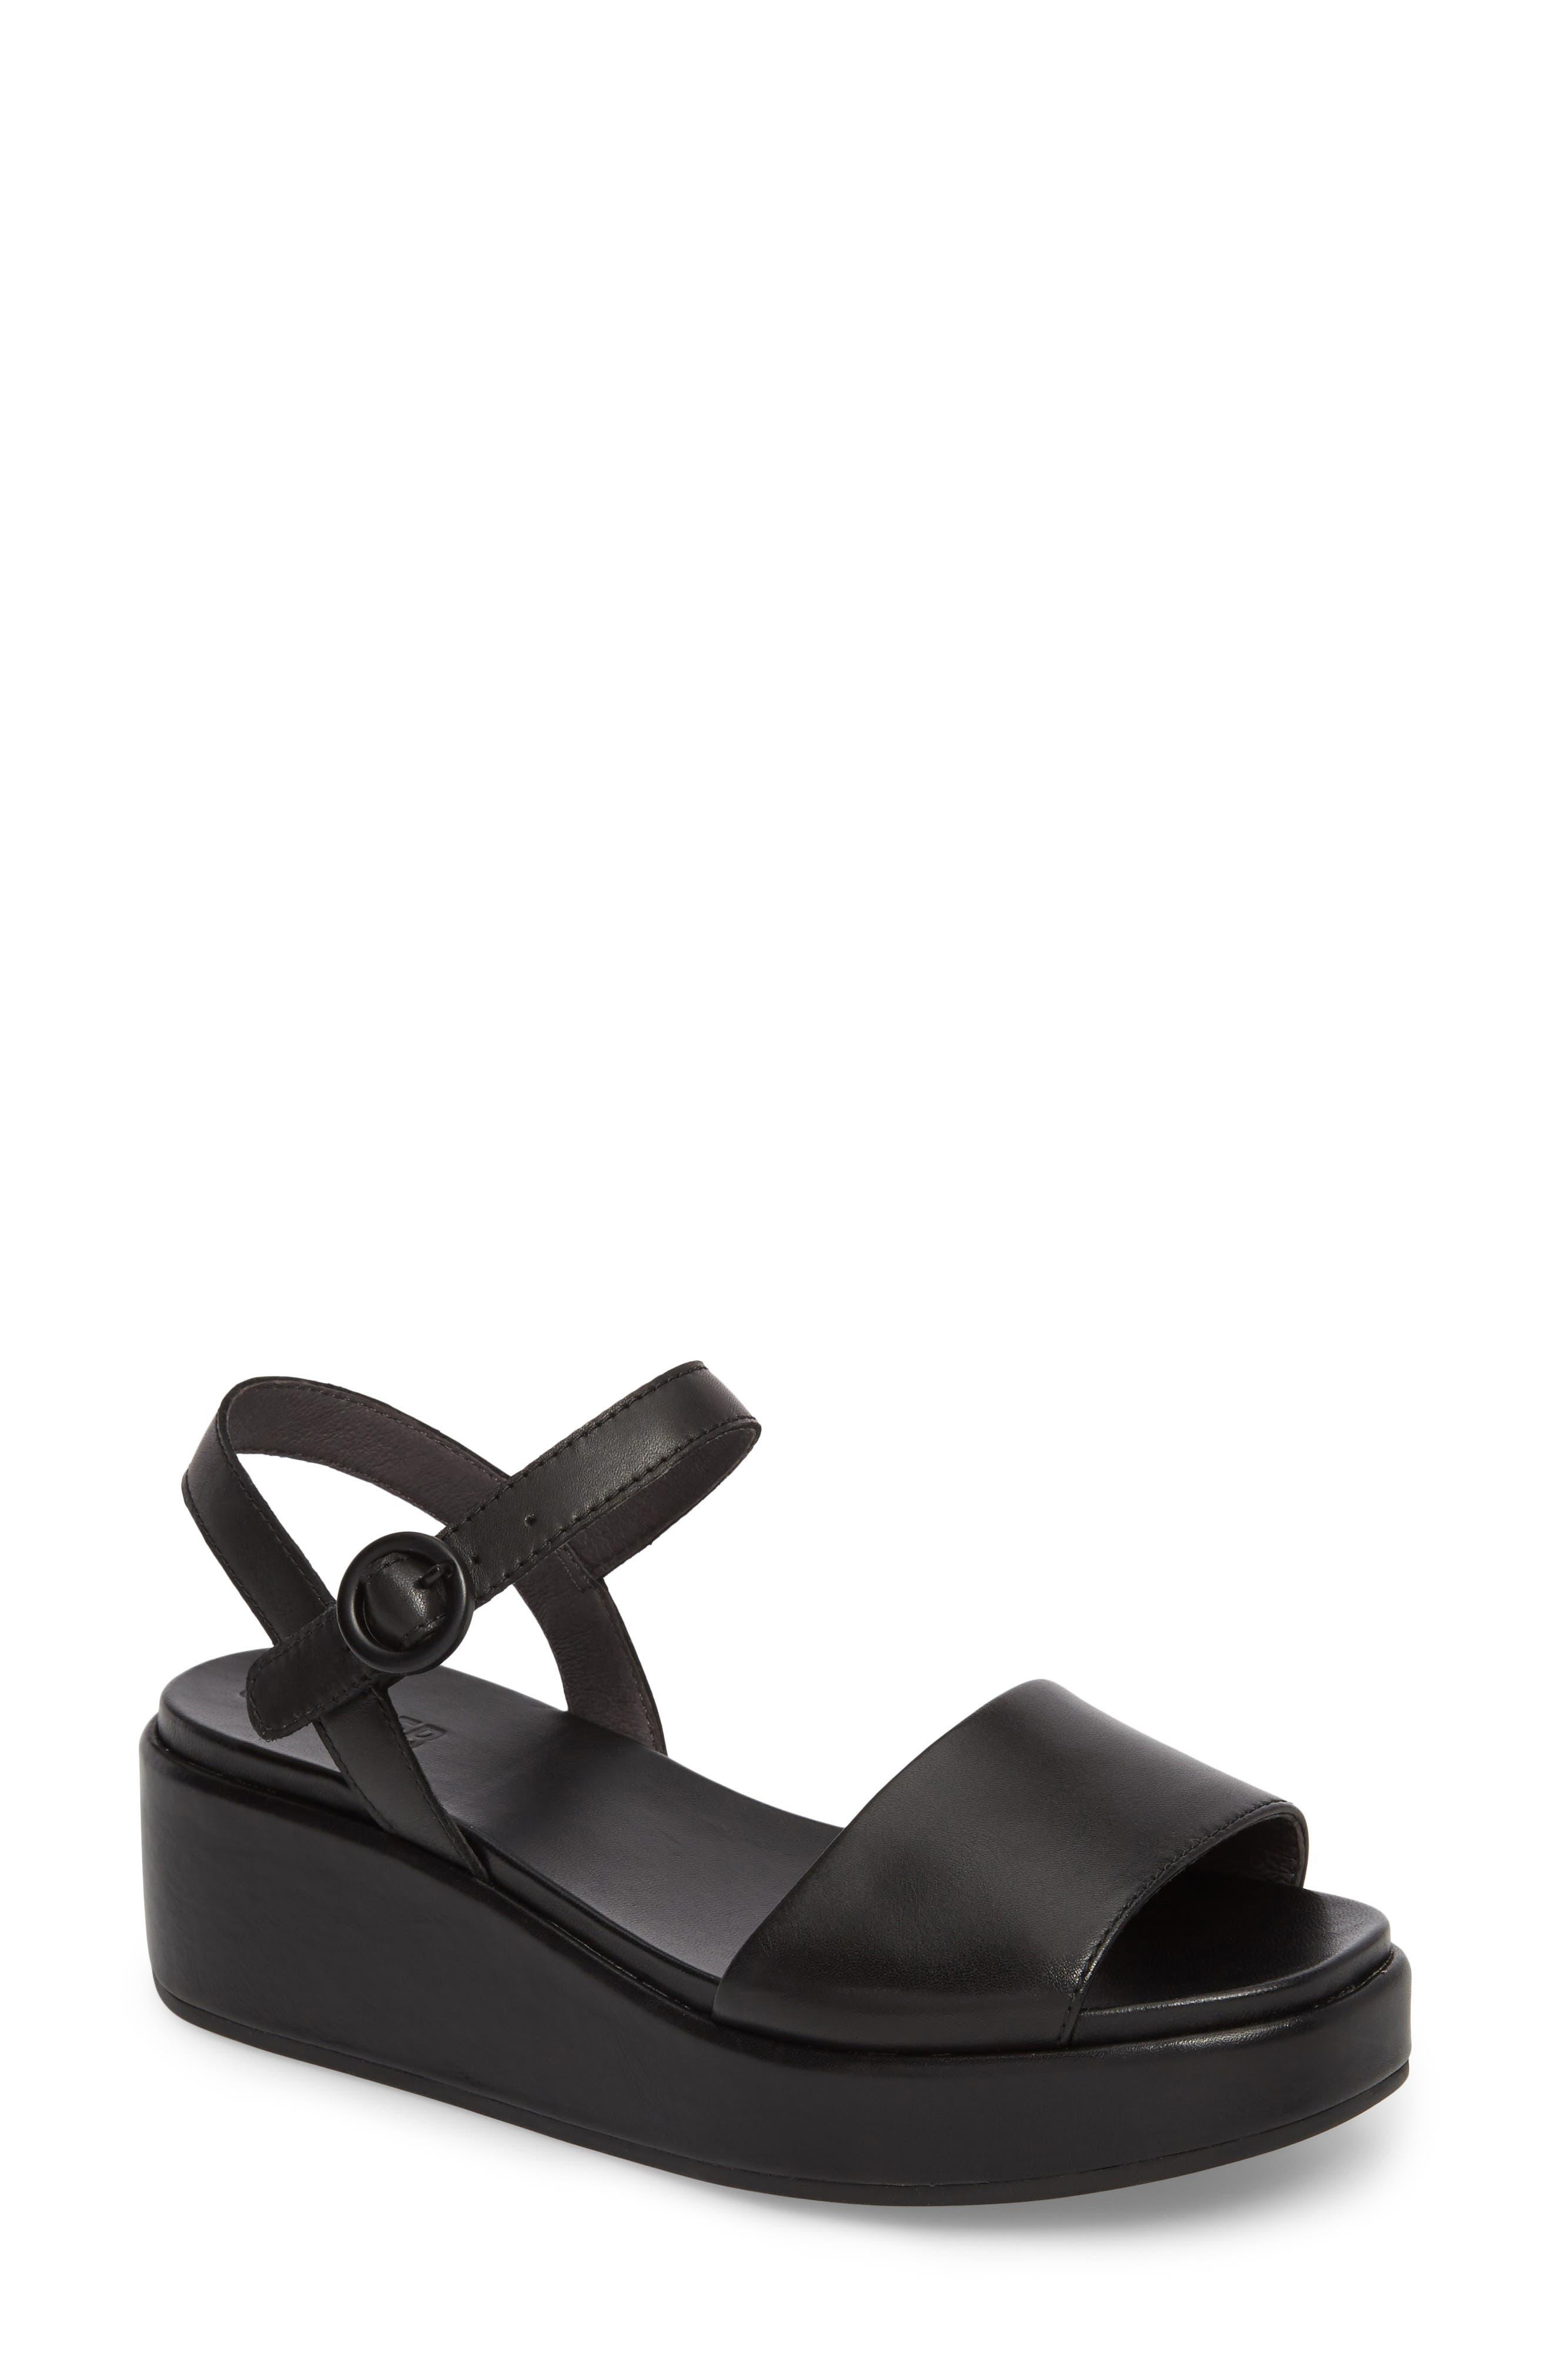 CAMPER, Misia Platform Wedge Sandal, Main thumbnail 1, color, BLACK LEATHER